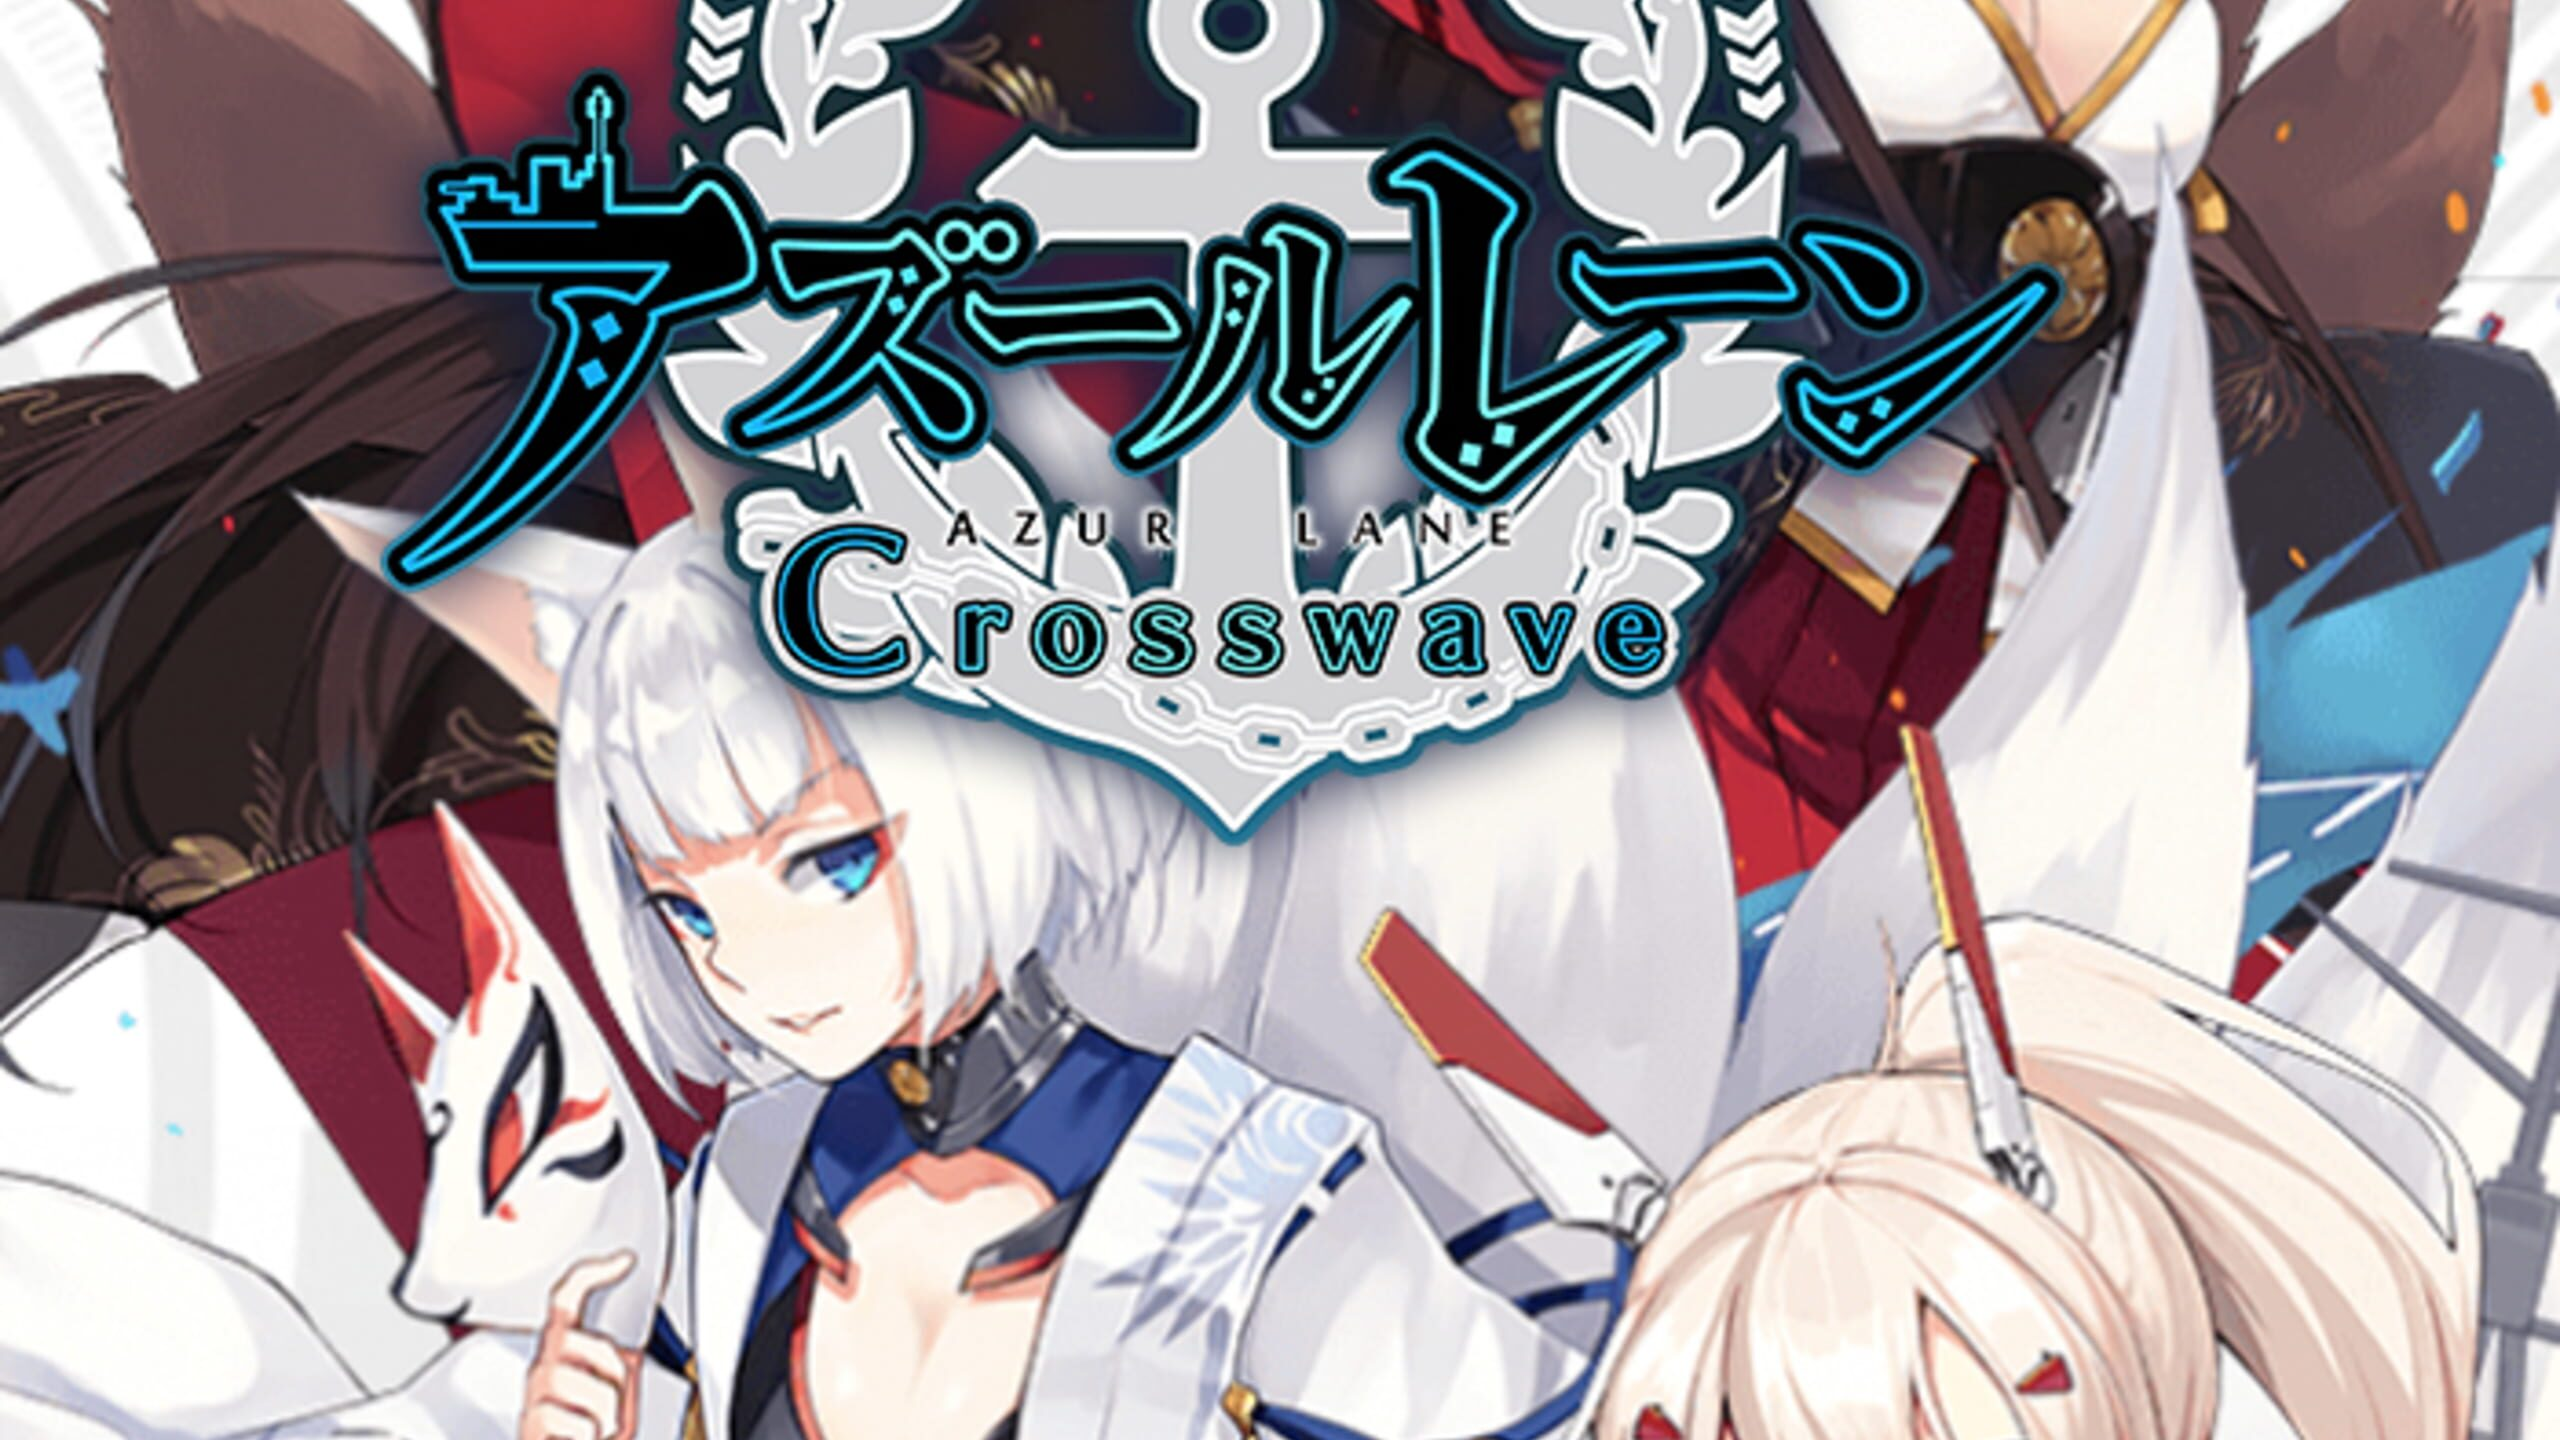 game cover art for Azur Lane: Crosswave